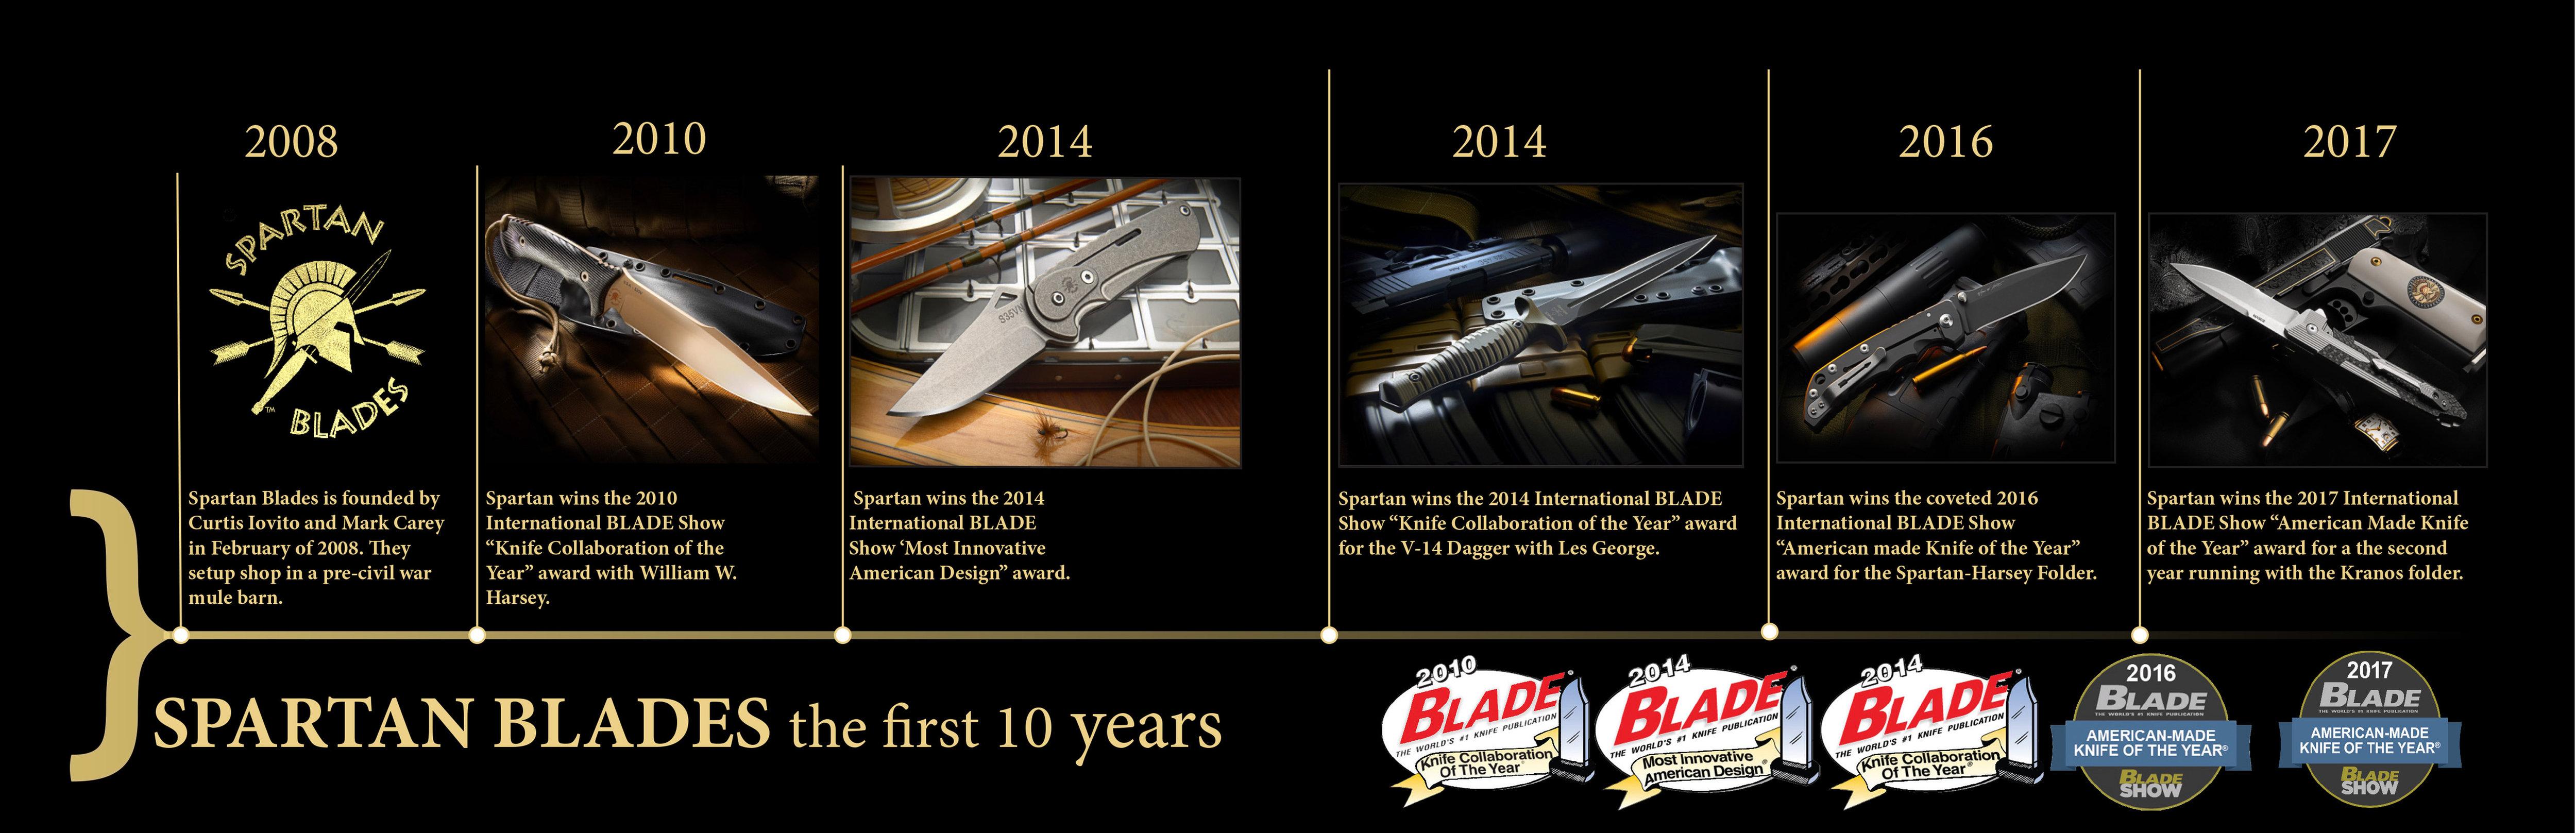 spartan-blades-timeline.jpg